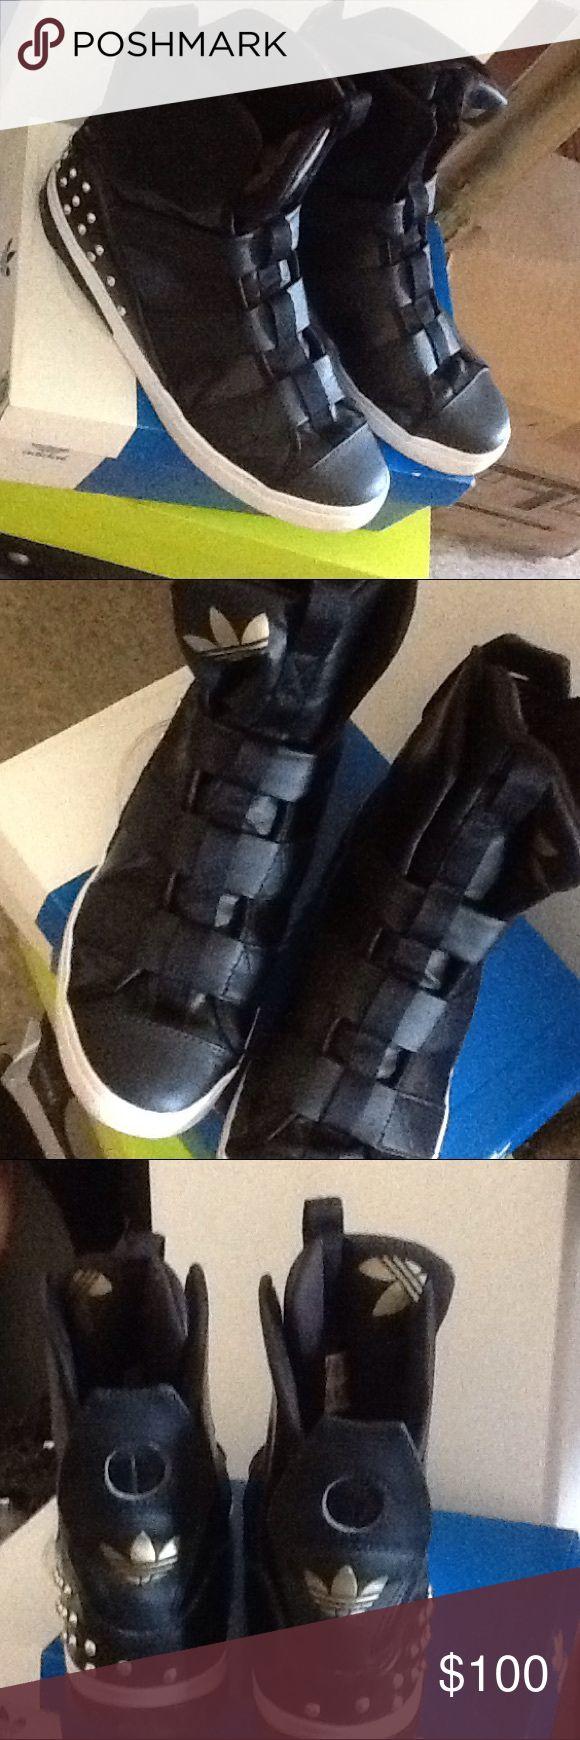 ADIDAS SUPERSTAR rare sneakers Super rare adidas sneakers, black/gold Adidas Shoes Athletic Shoes